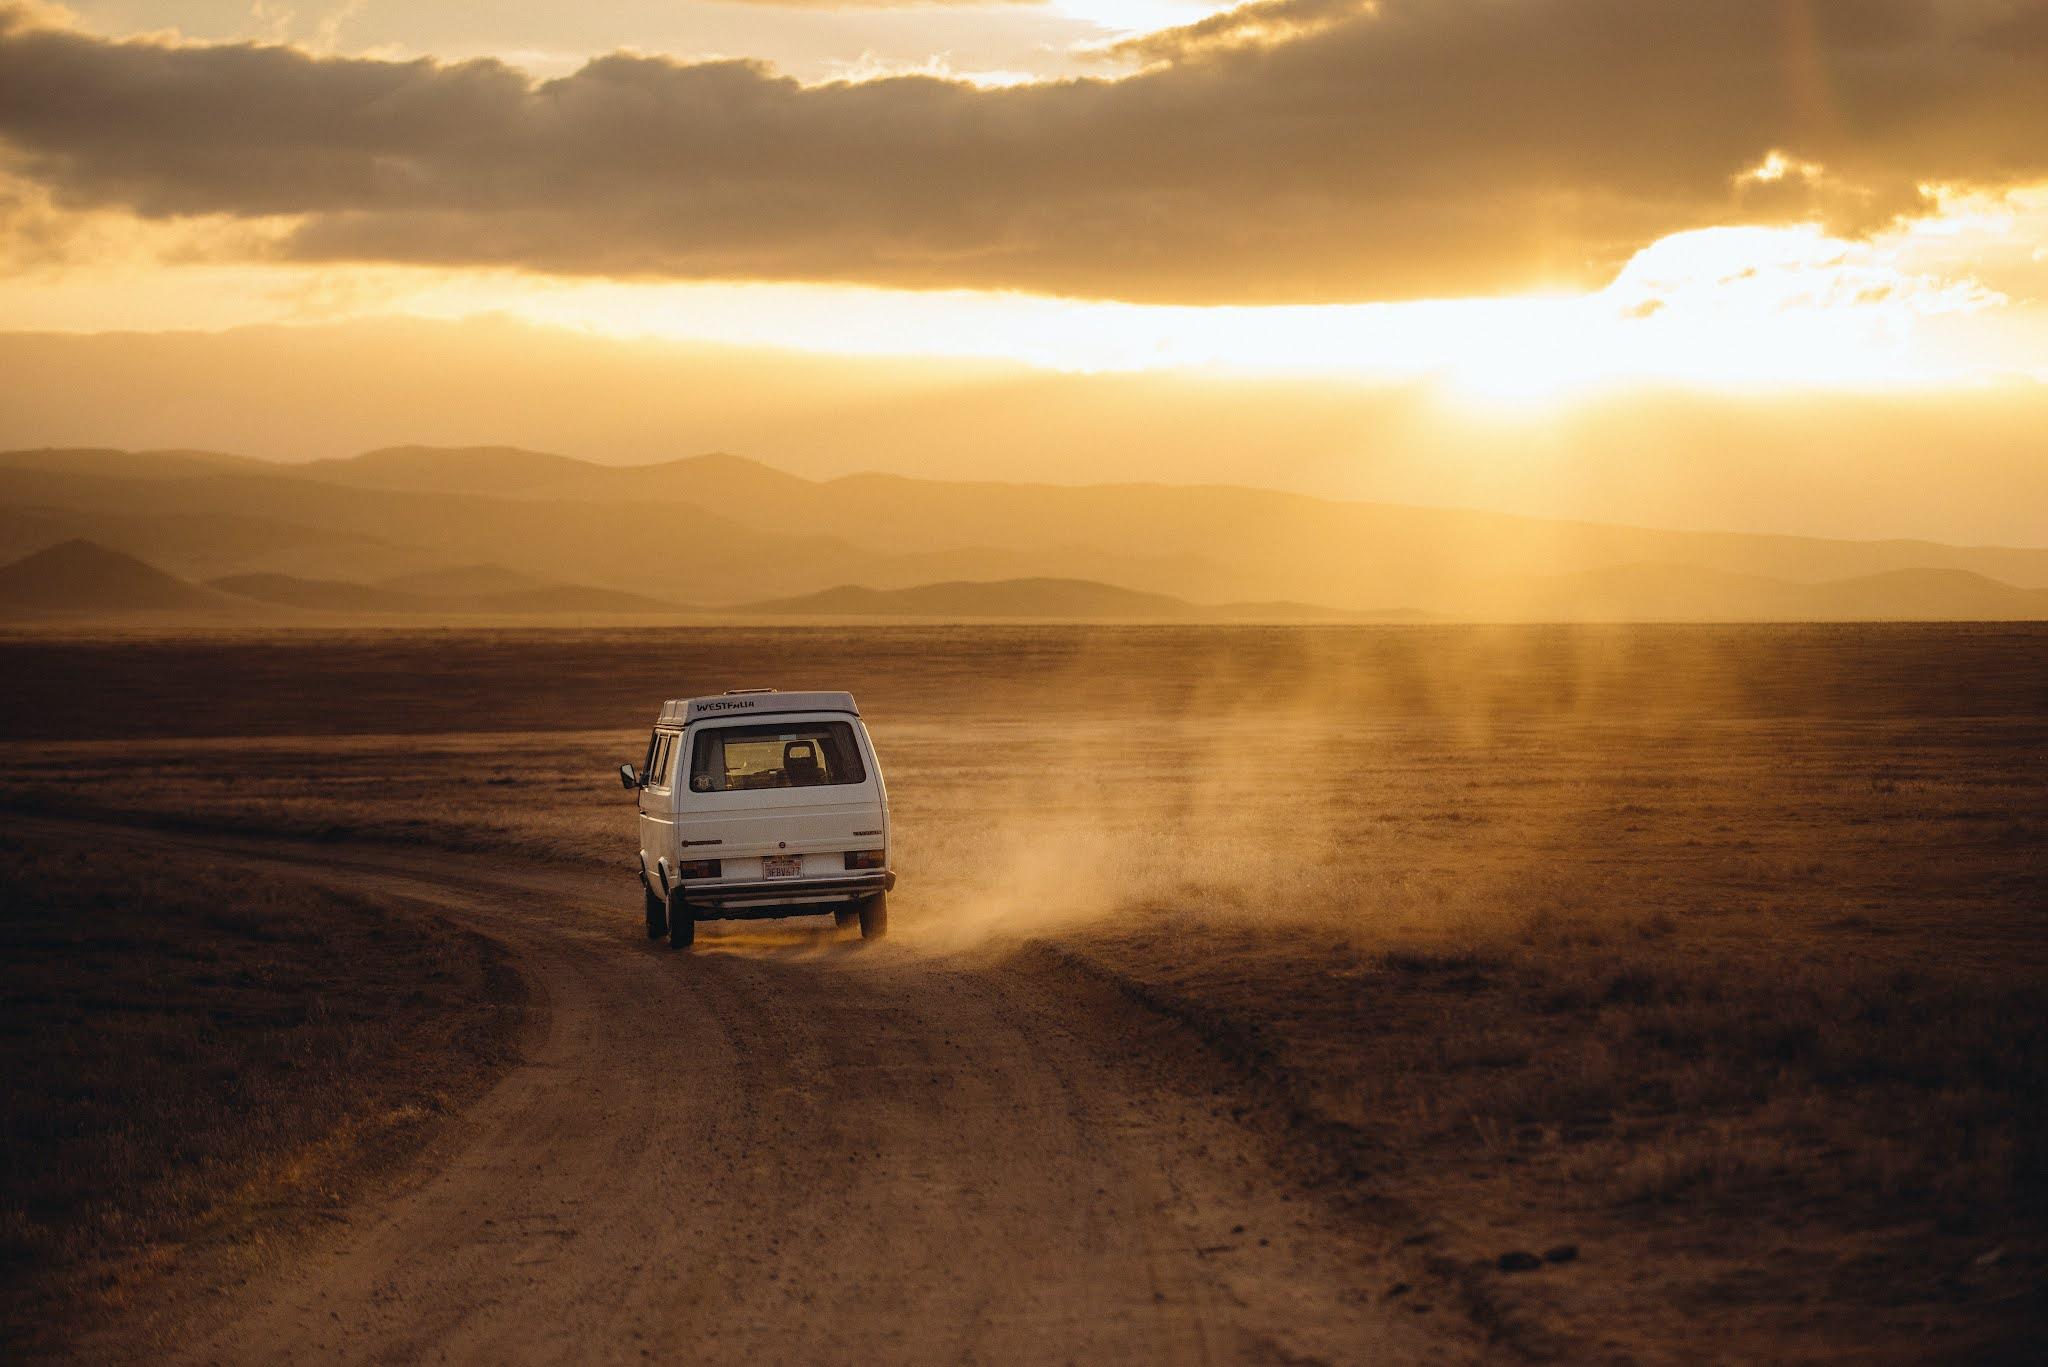 American Dust, Richard Brautigan